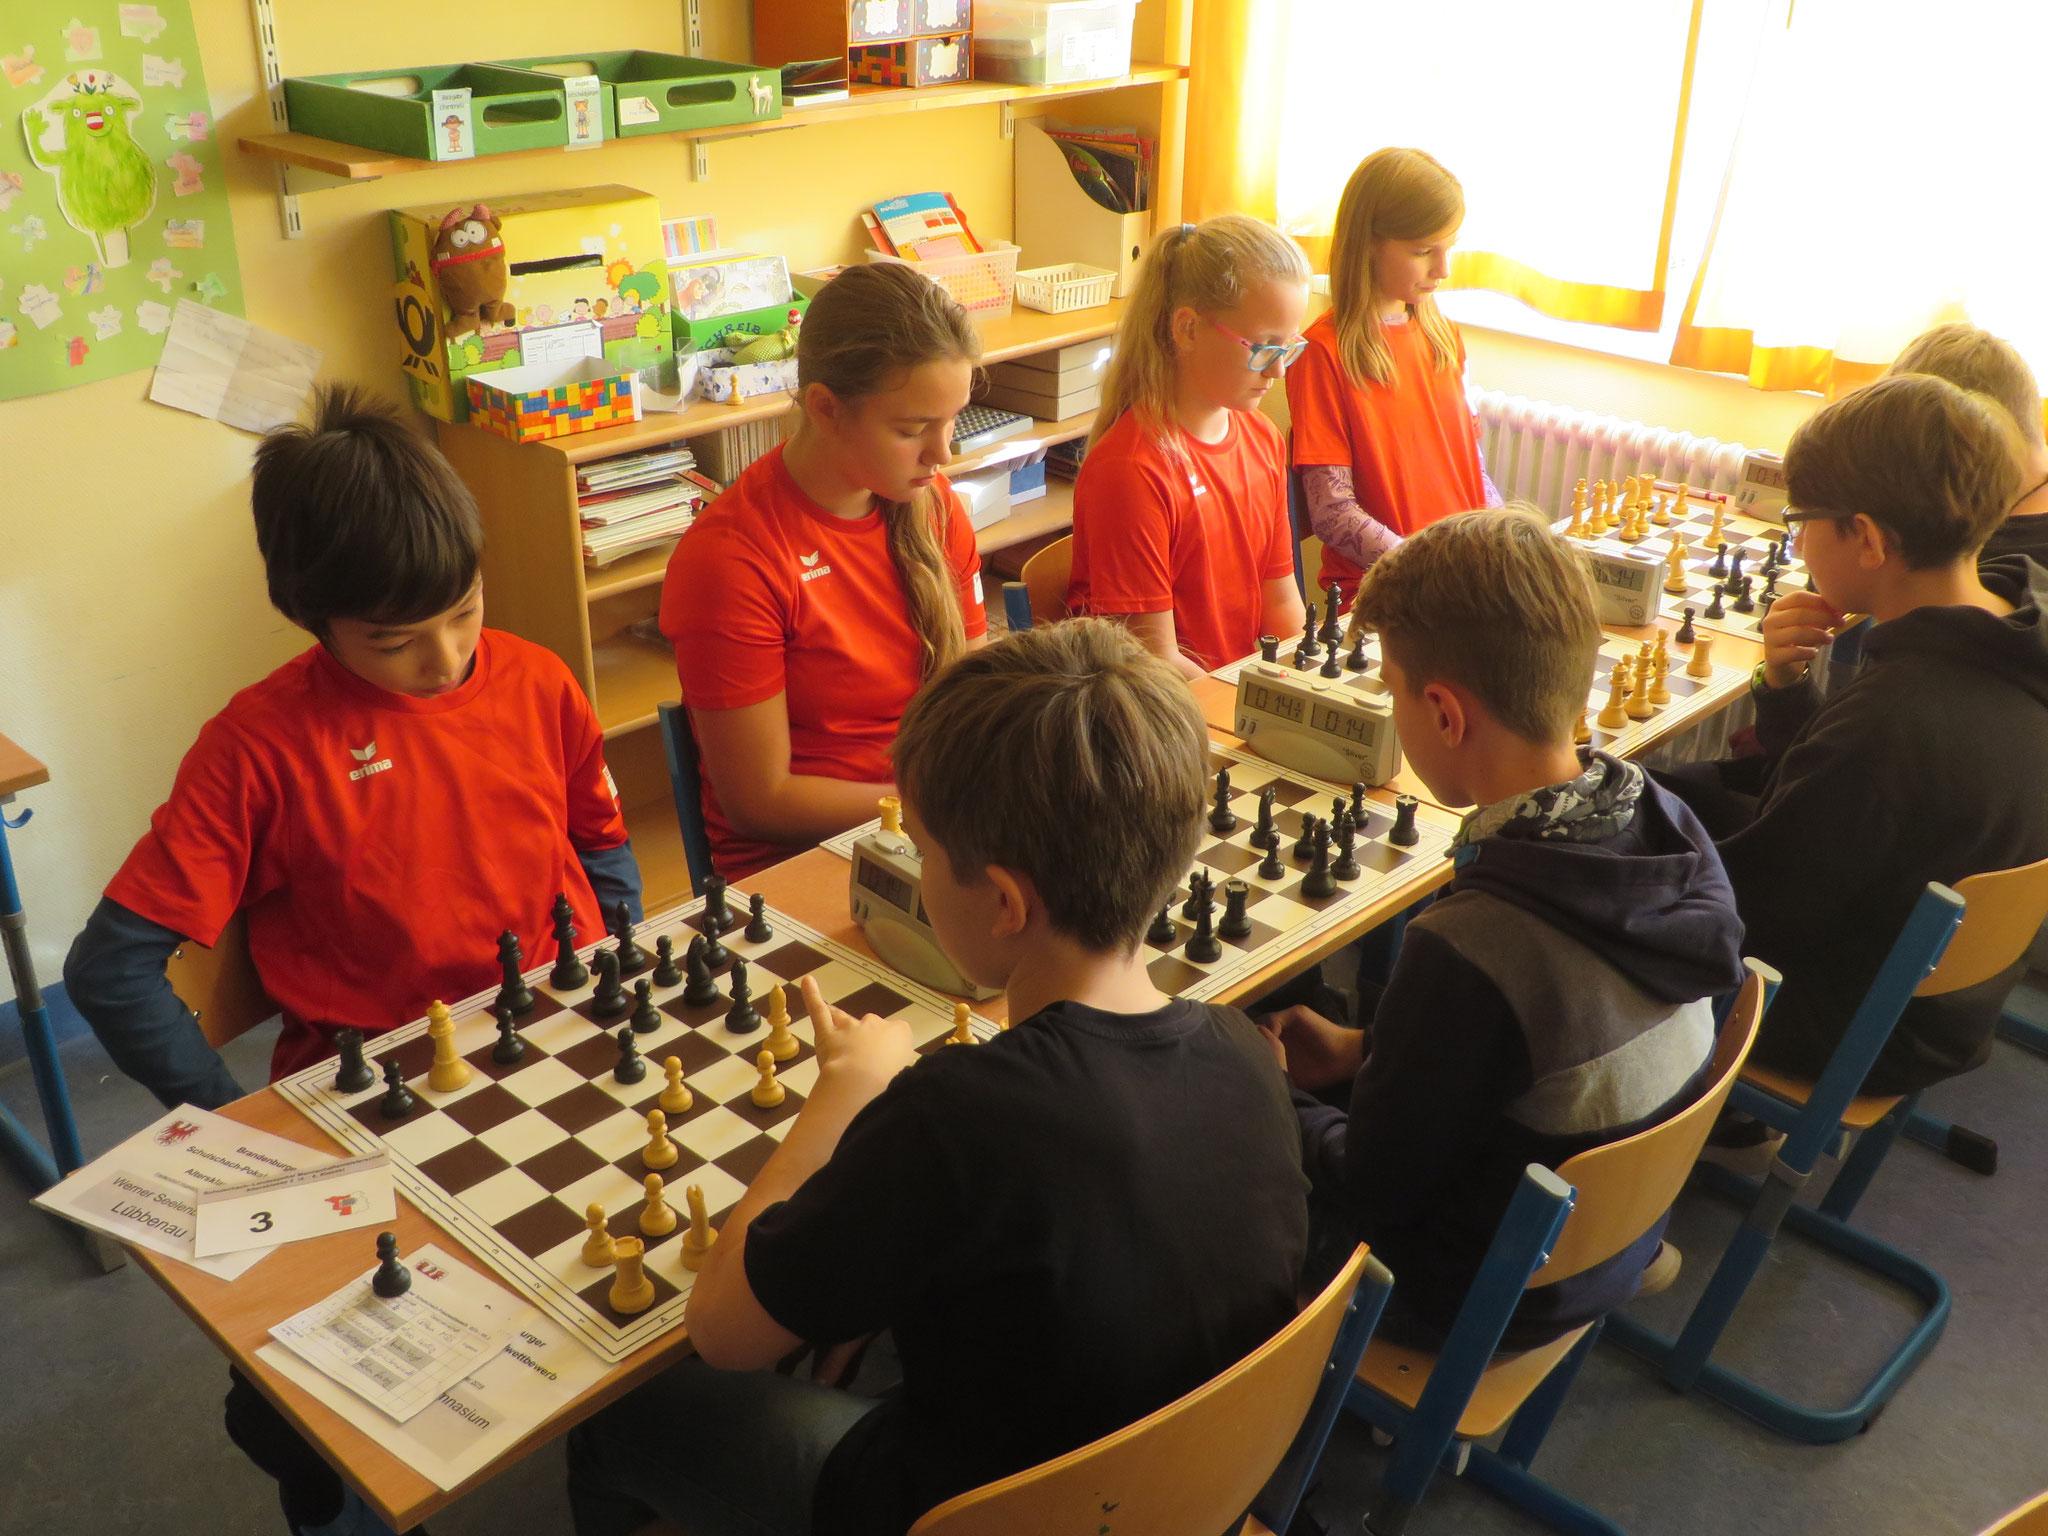 AK 2 : Das Team der Werner-Seelenbinder-GS I in Runde 2 mit Henry (Brett 1) , Aleksandra (Brett 2) , Anna (Brett 3) und Marie (Brett 4)